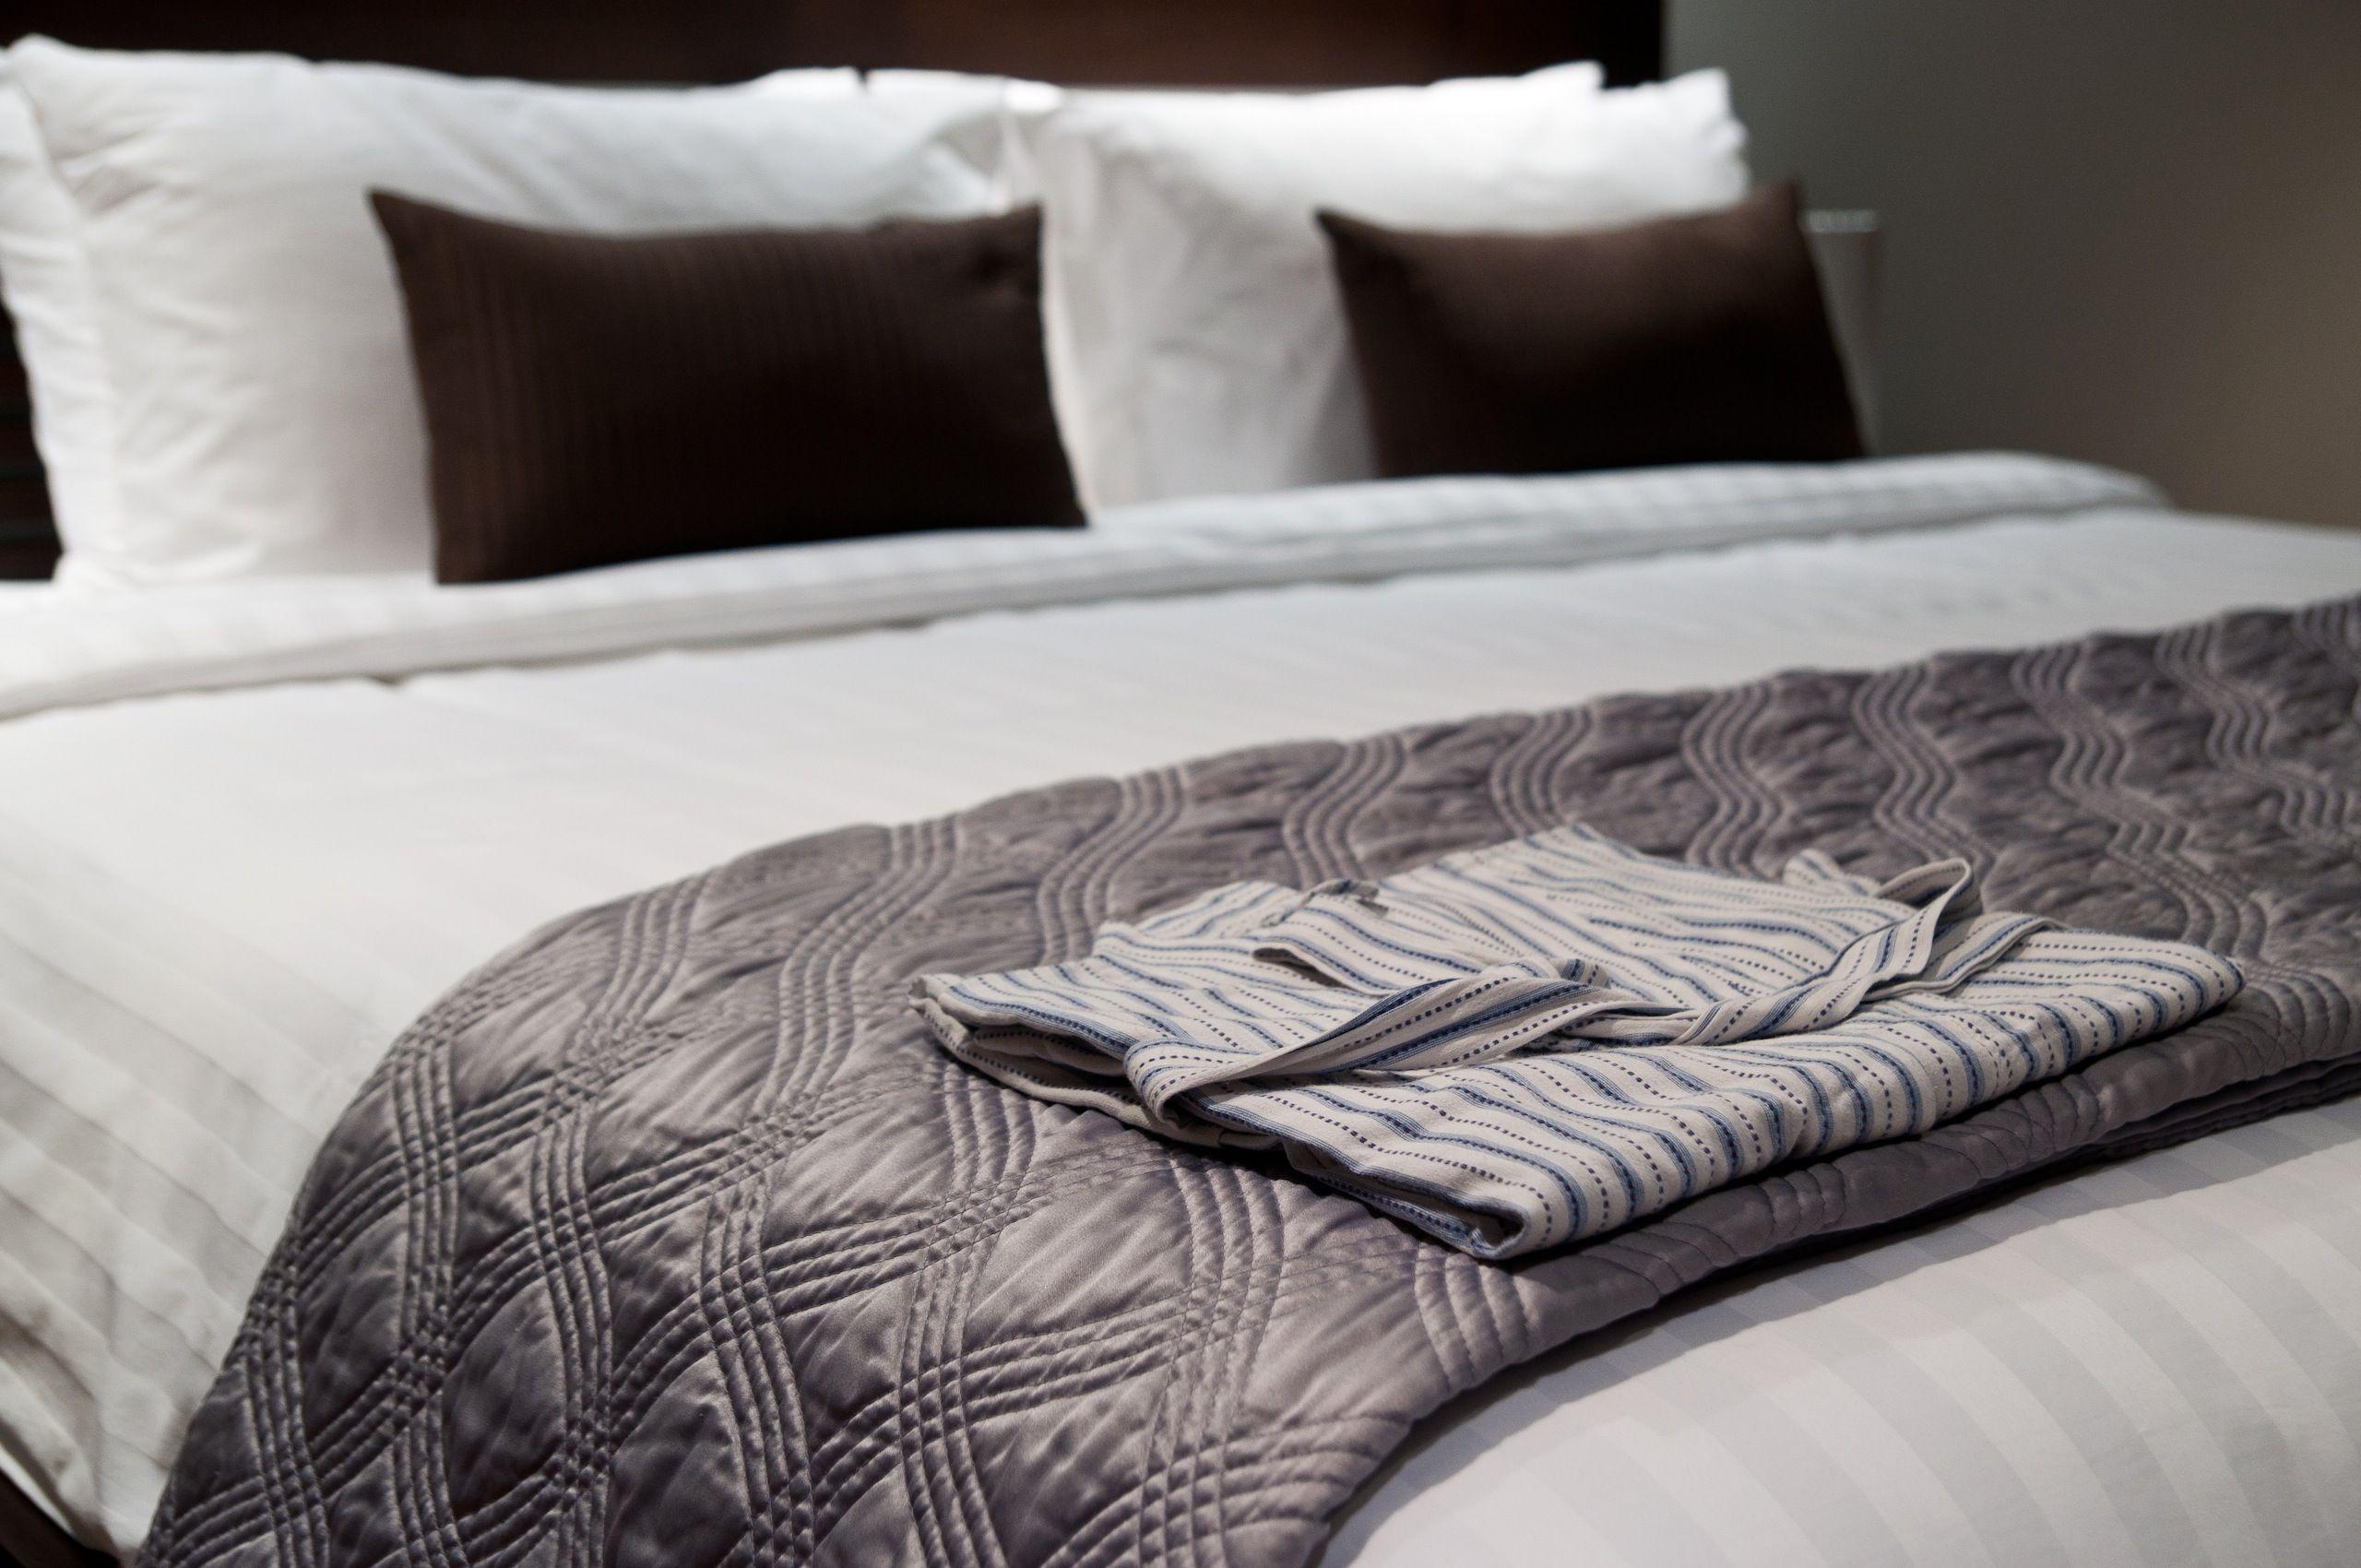 7 bedtime behaviors that will help you sleep